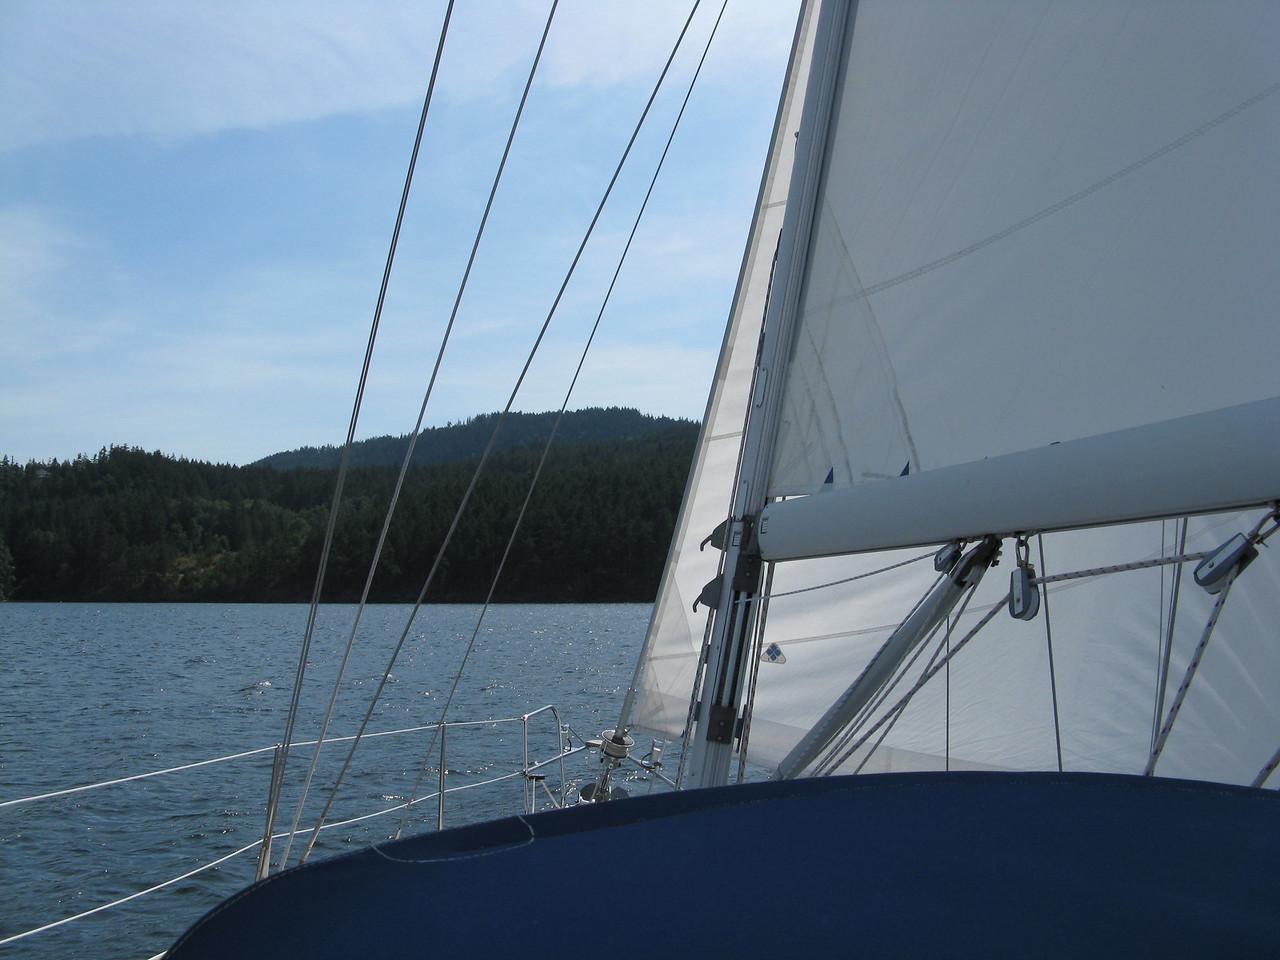 09 07 26-08 02 Sail SJ 353